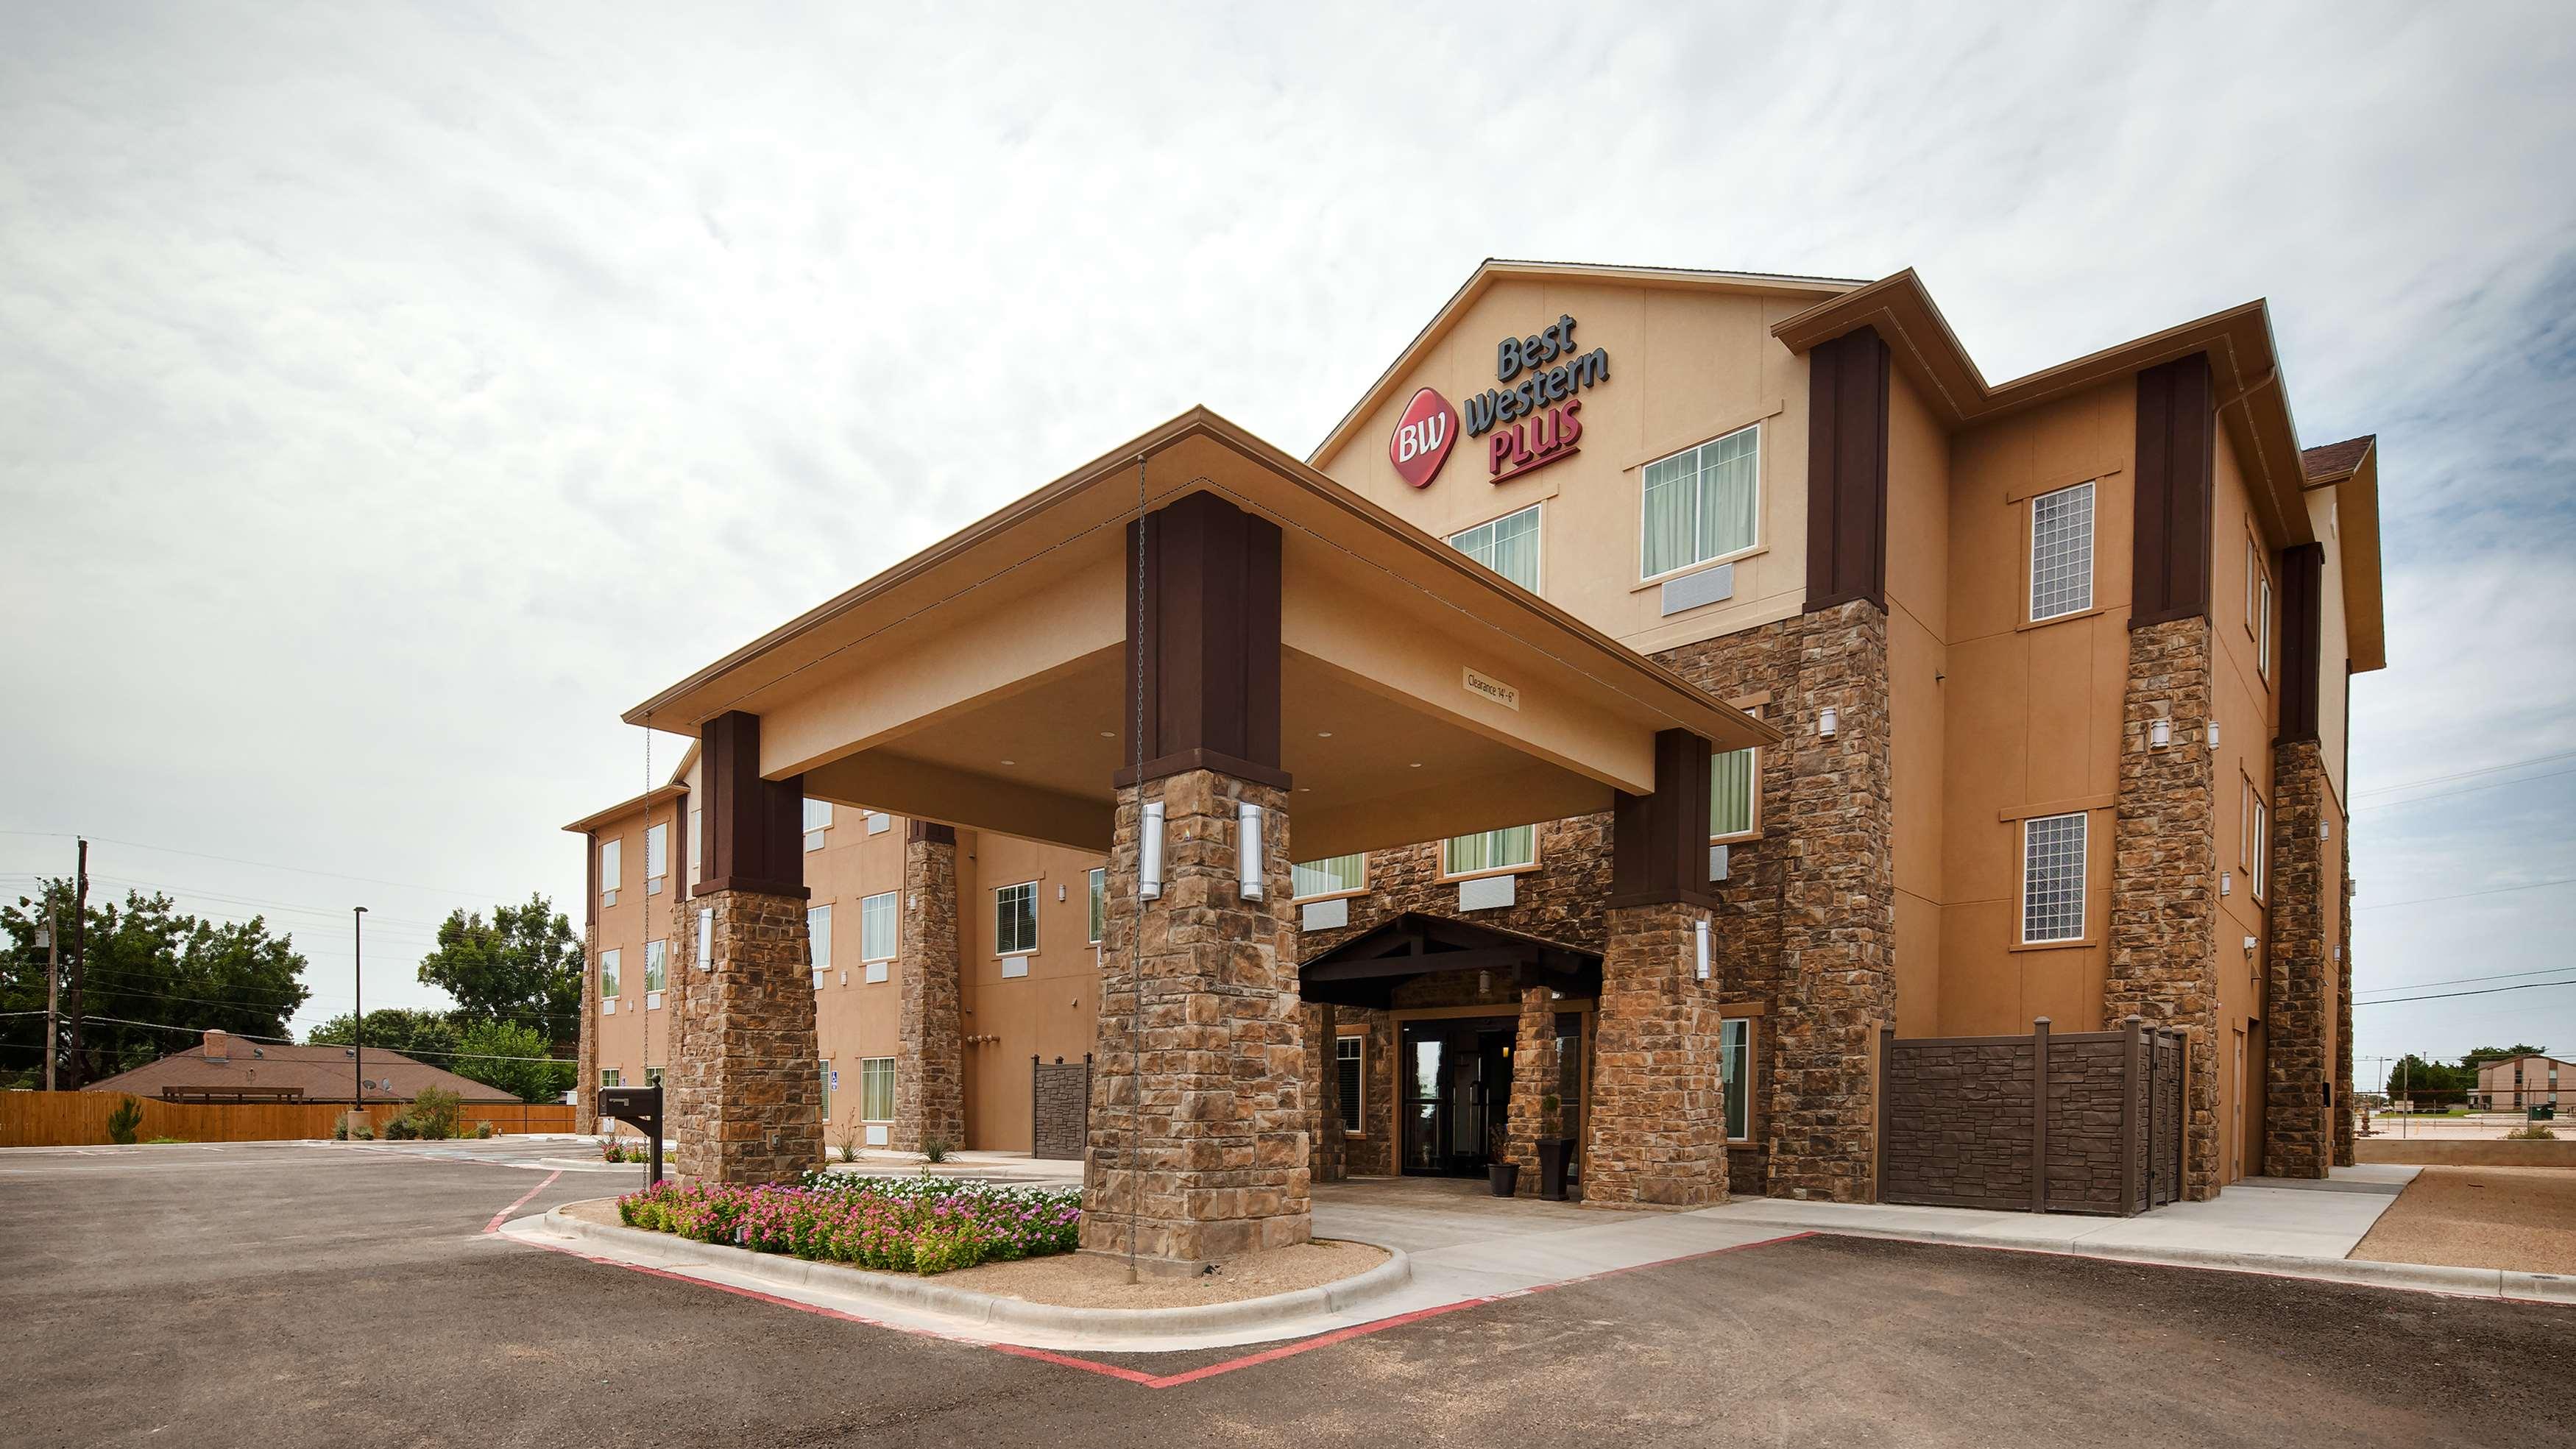 Best Western Plus Denver City Hotel & Suites image 0